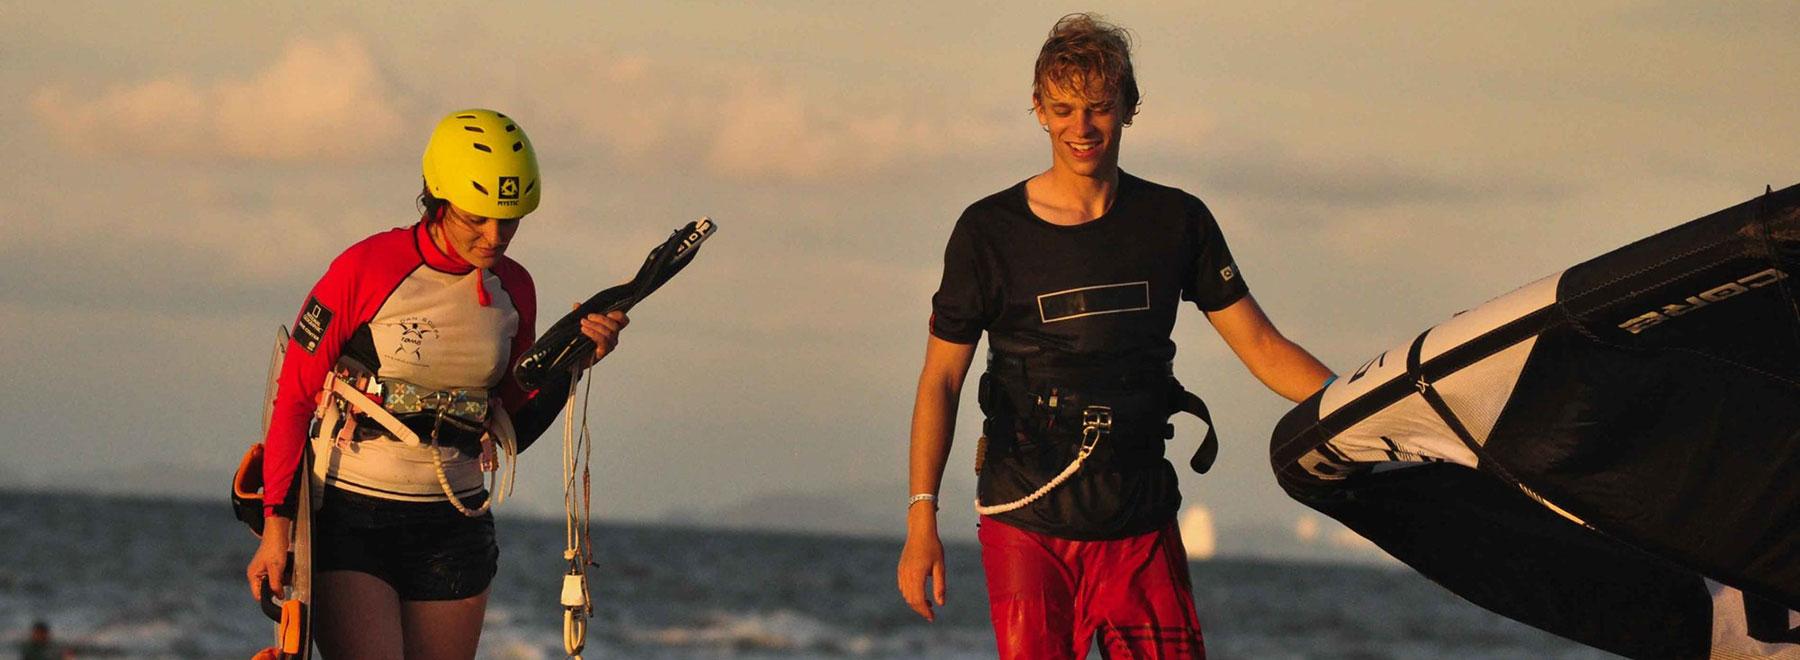 Kitesurfen-lernen-in-Panama,Punta-Chame